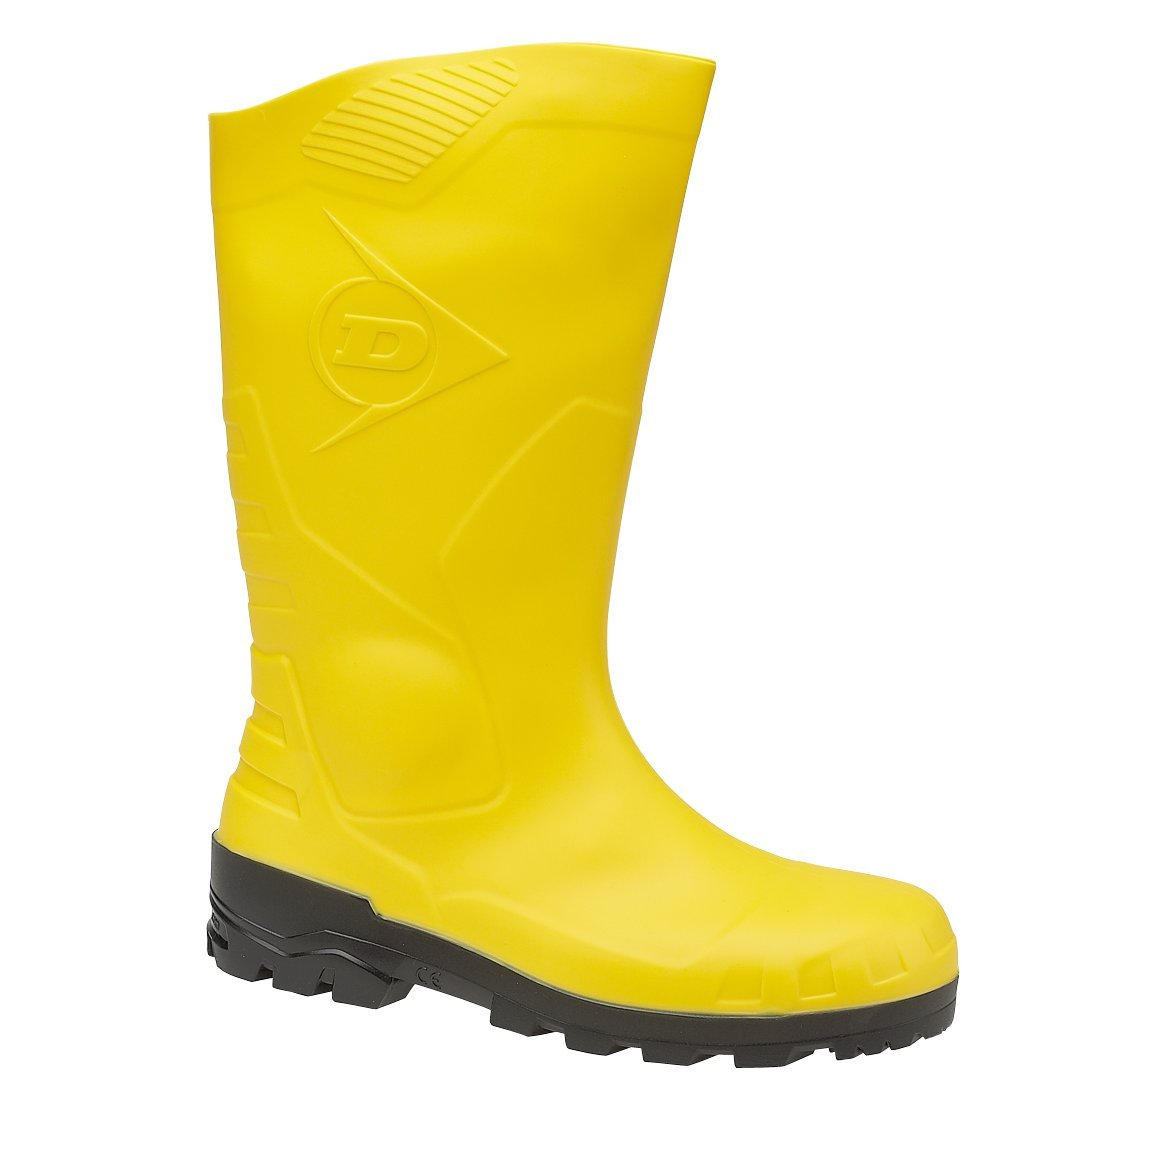 Dunlop Devon Full Safety Wellington Mens Boot, S5 H142011